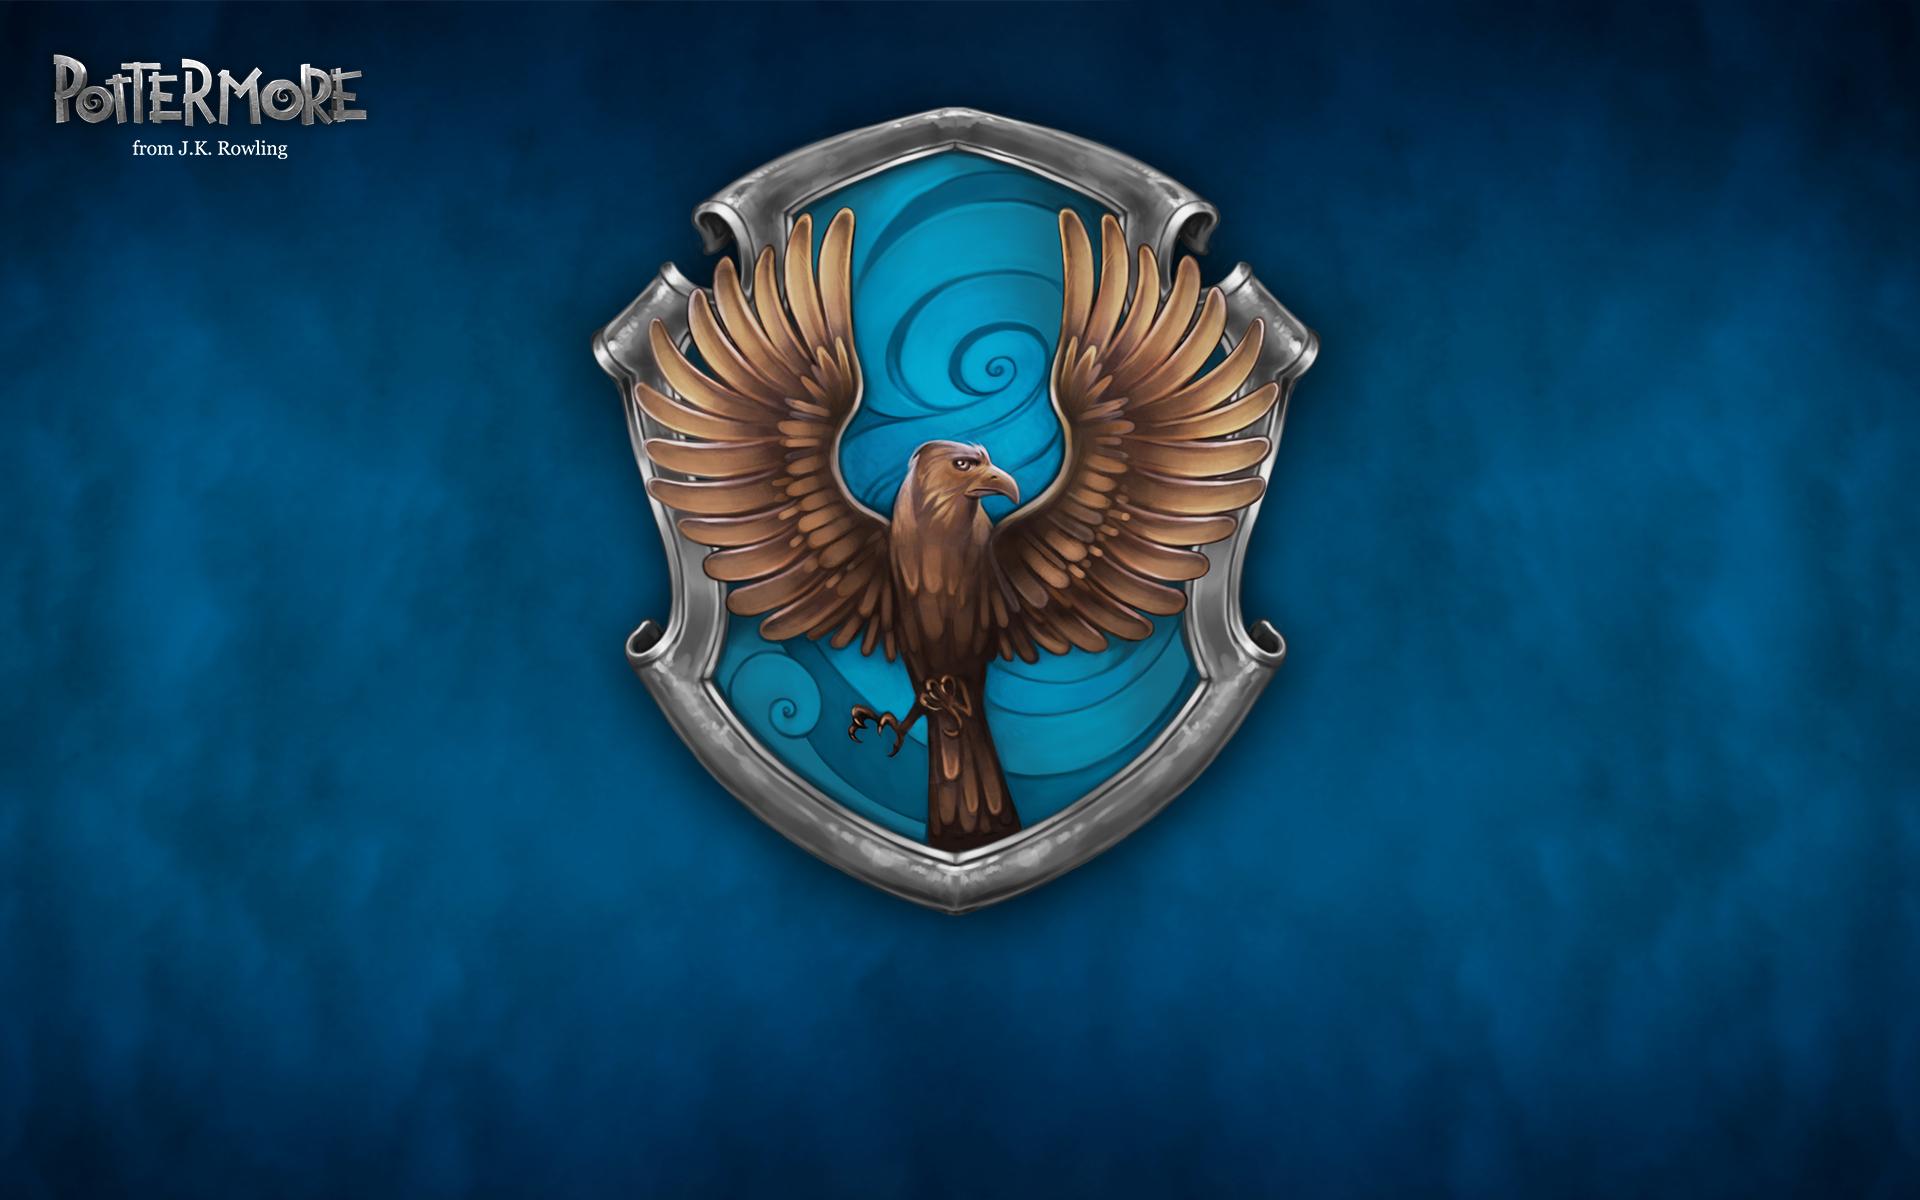 Harry Potter Ravenclaw Wallpaper - WallpaperSafari